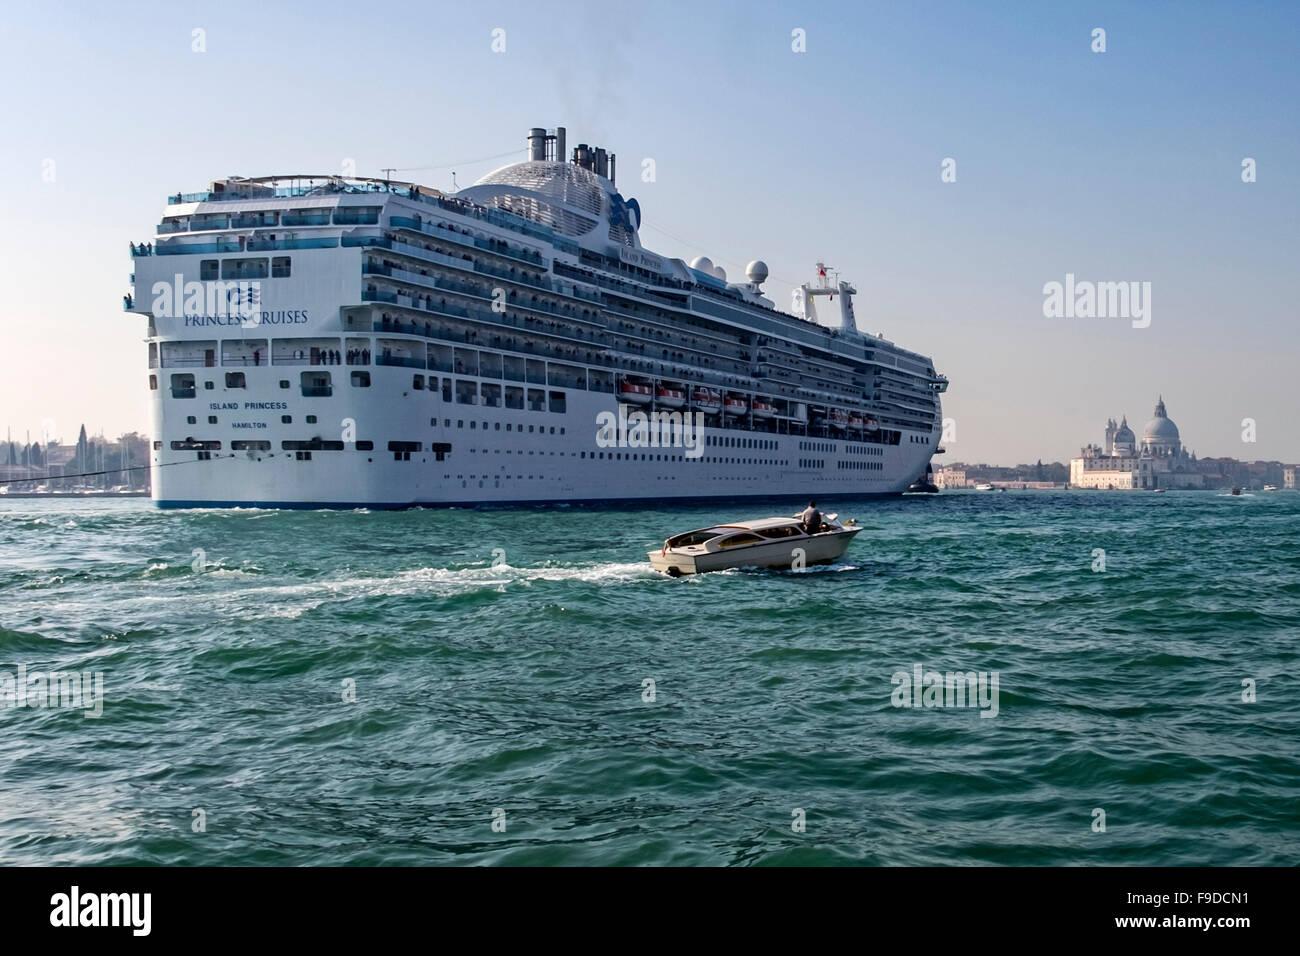 Venice, Italy - Princess cruises cruise ship arriving with view of church, Basilica di Santa Maria della Salute - Stock Image